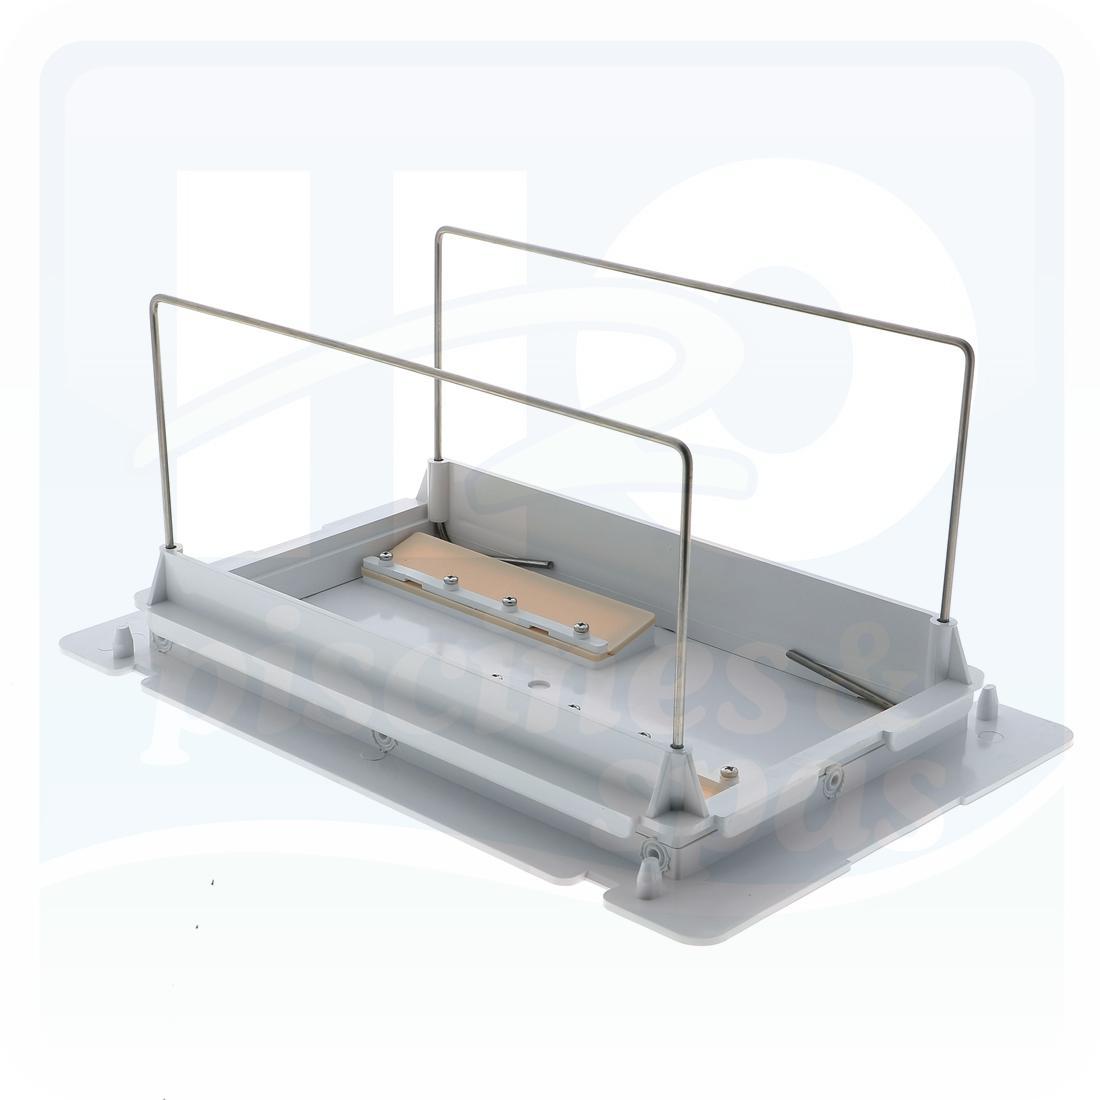 Porte-Filtre Complet Du Robot De Piscine Zodiac Indigo - H2O Piscines & Spas dedans Robot Piscine Zodiac Indigo